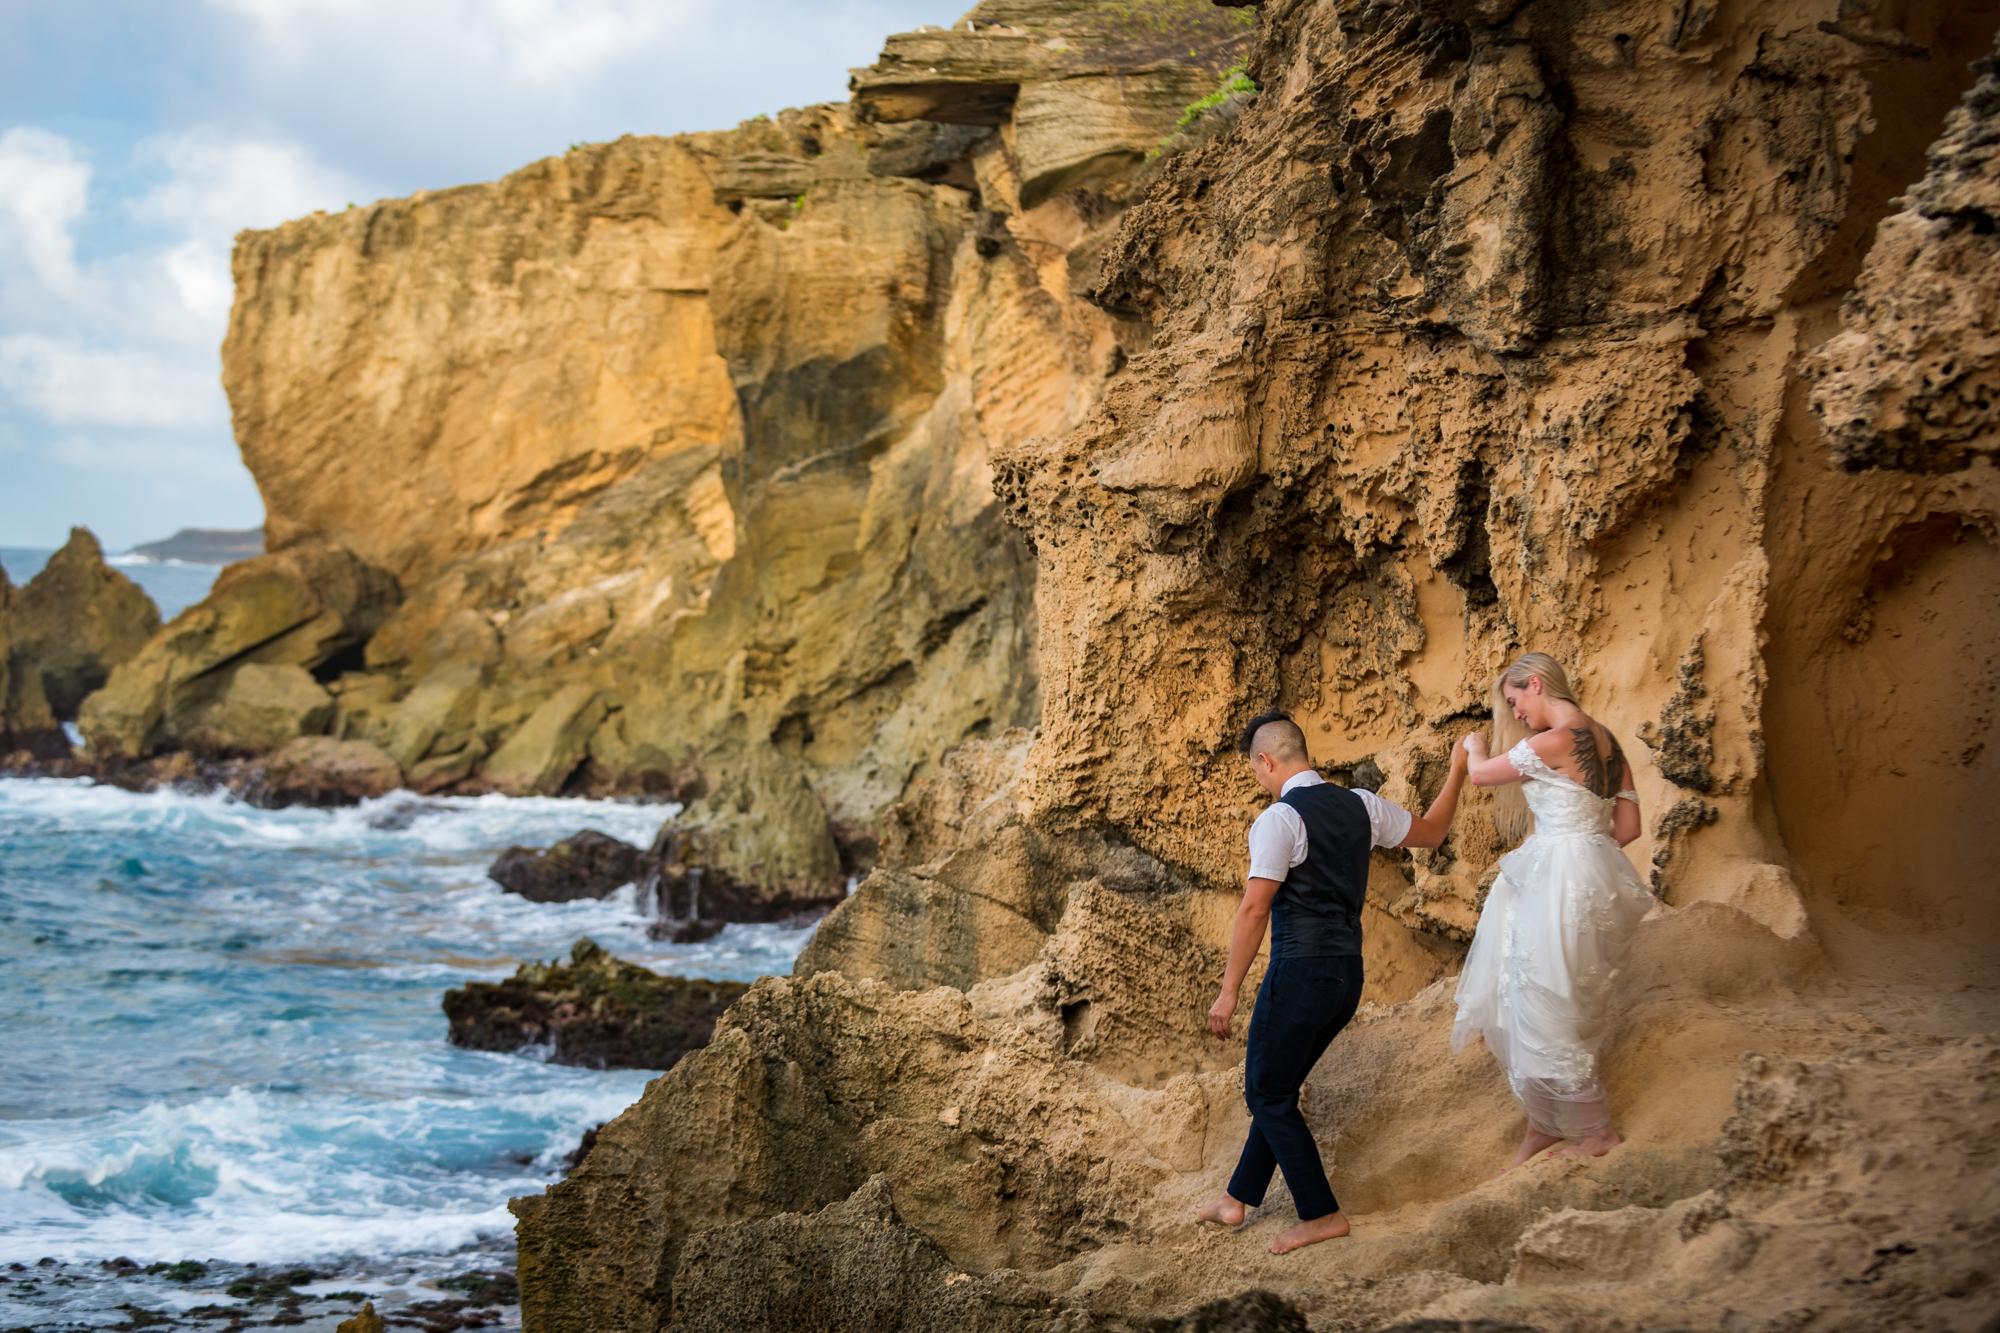 sunrise-wedding-coleen-shipwrecks-6-29-2919-9508.jpg